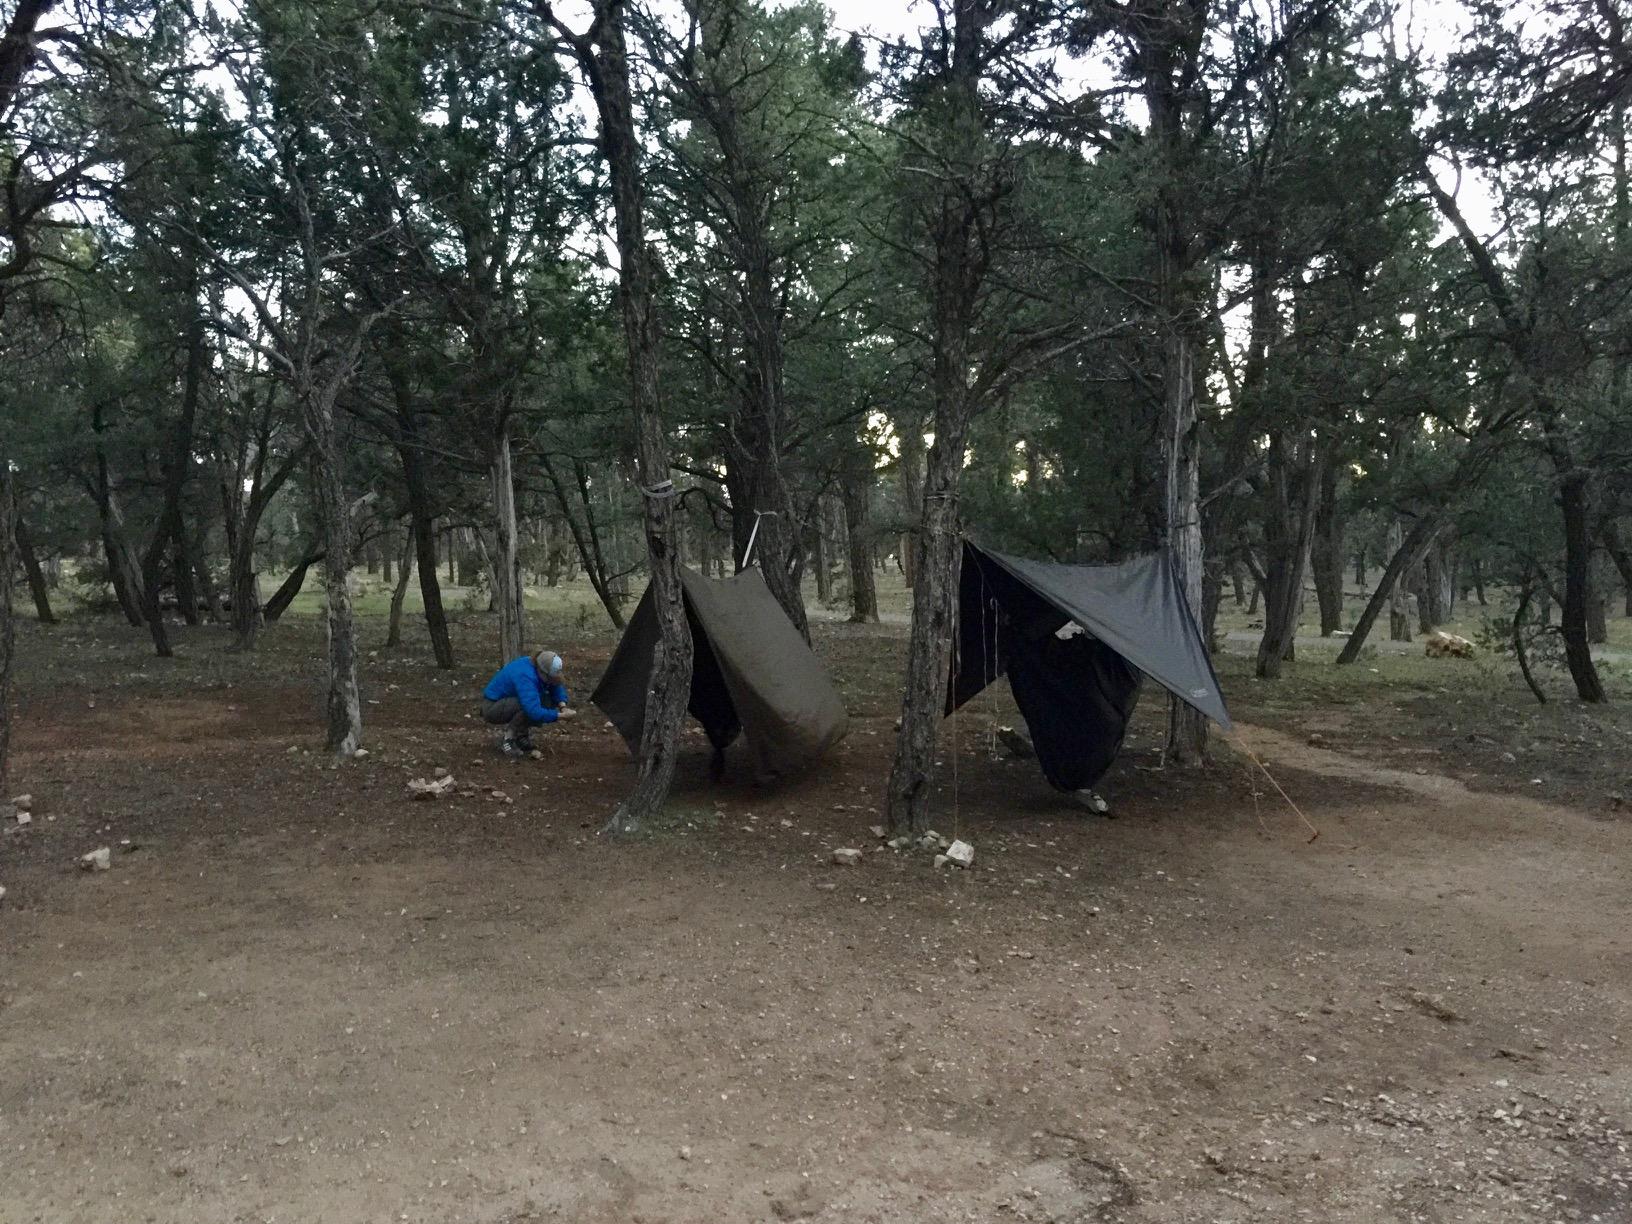 Hocking Hills Full branchement Camping